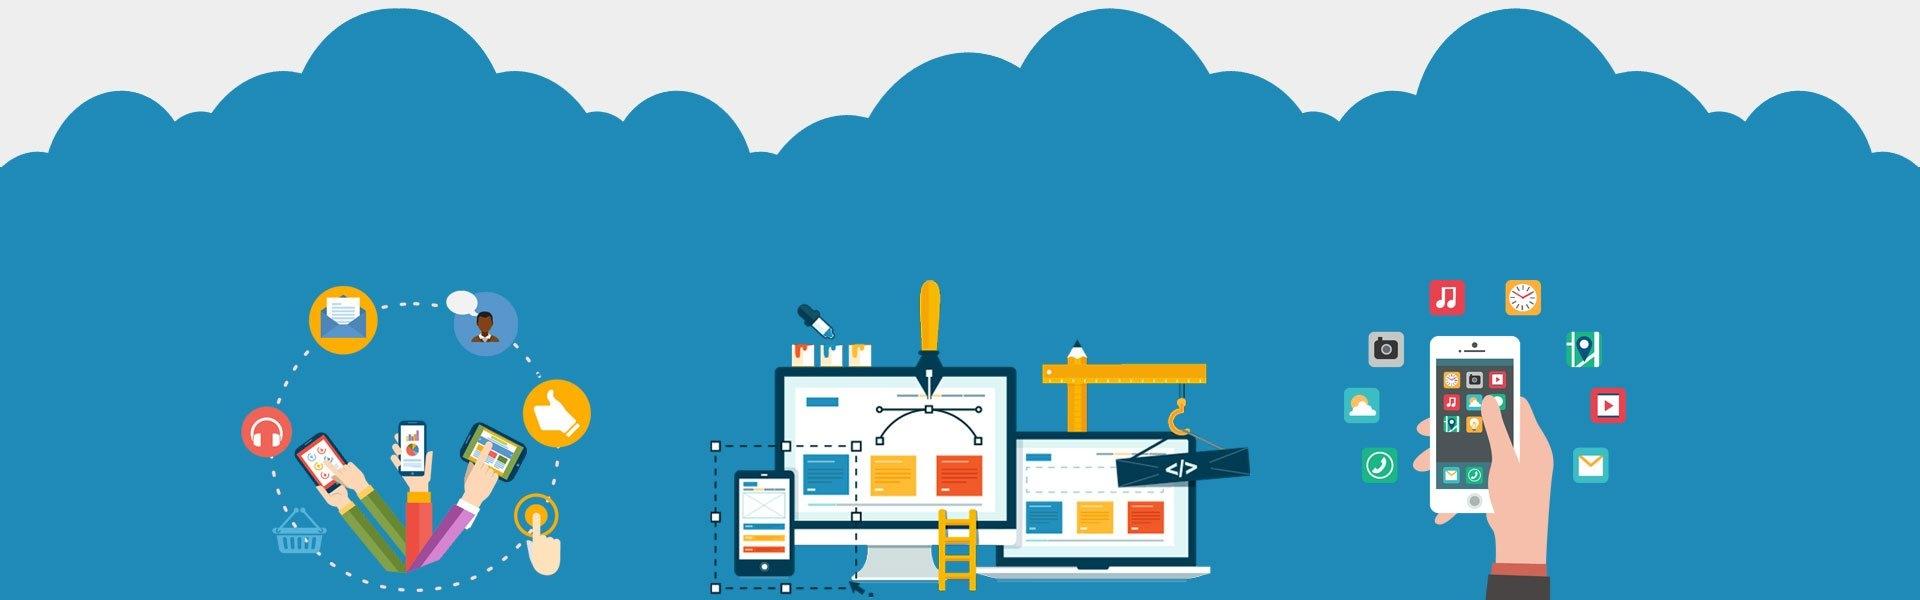 Webinventiv Technologies (@webinventiv) Cover Image